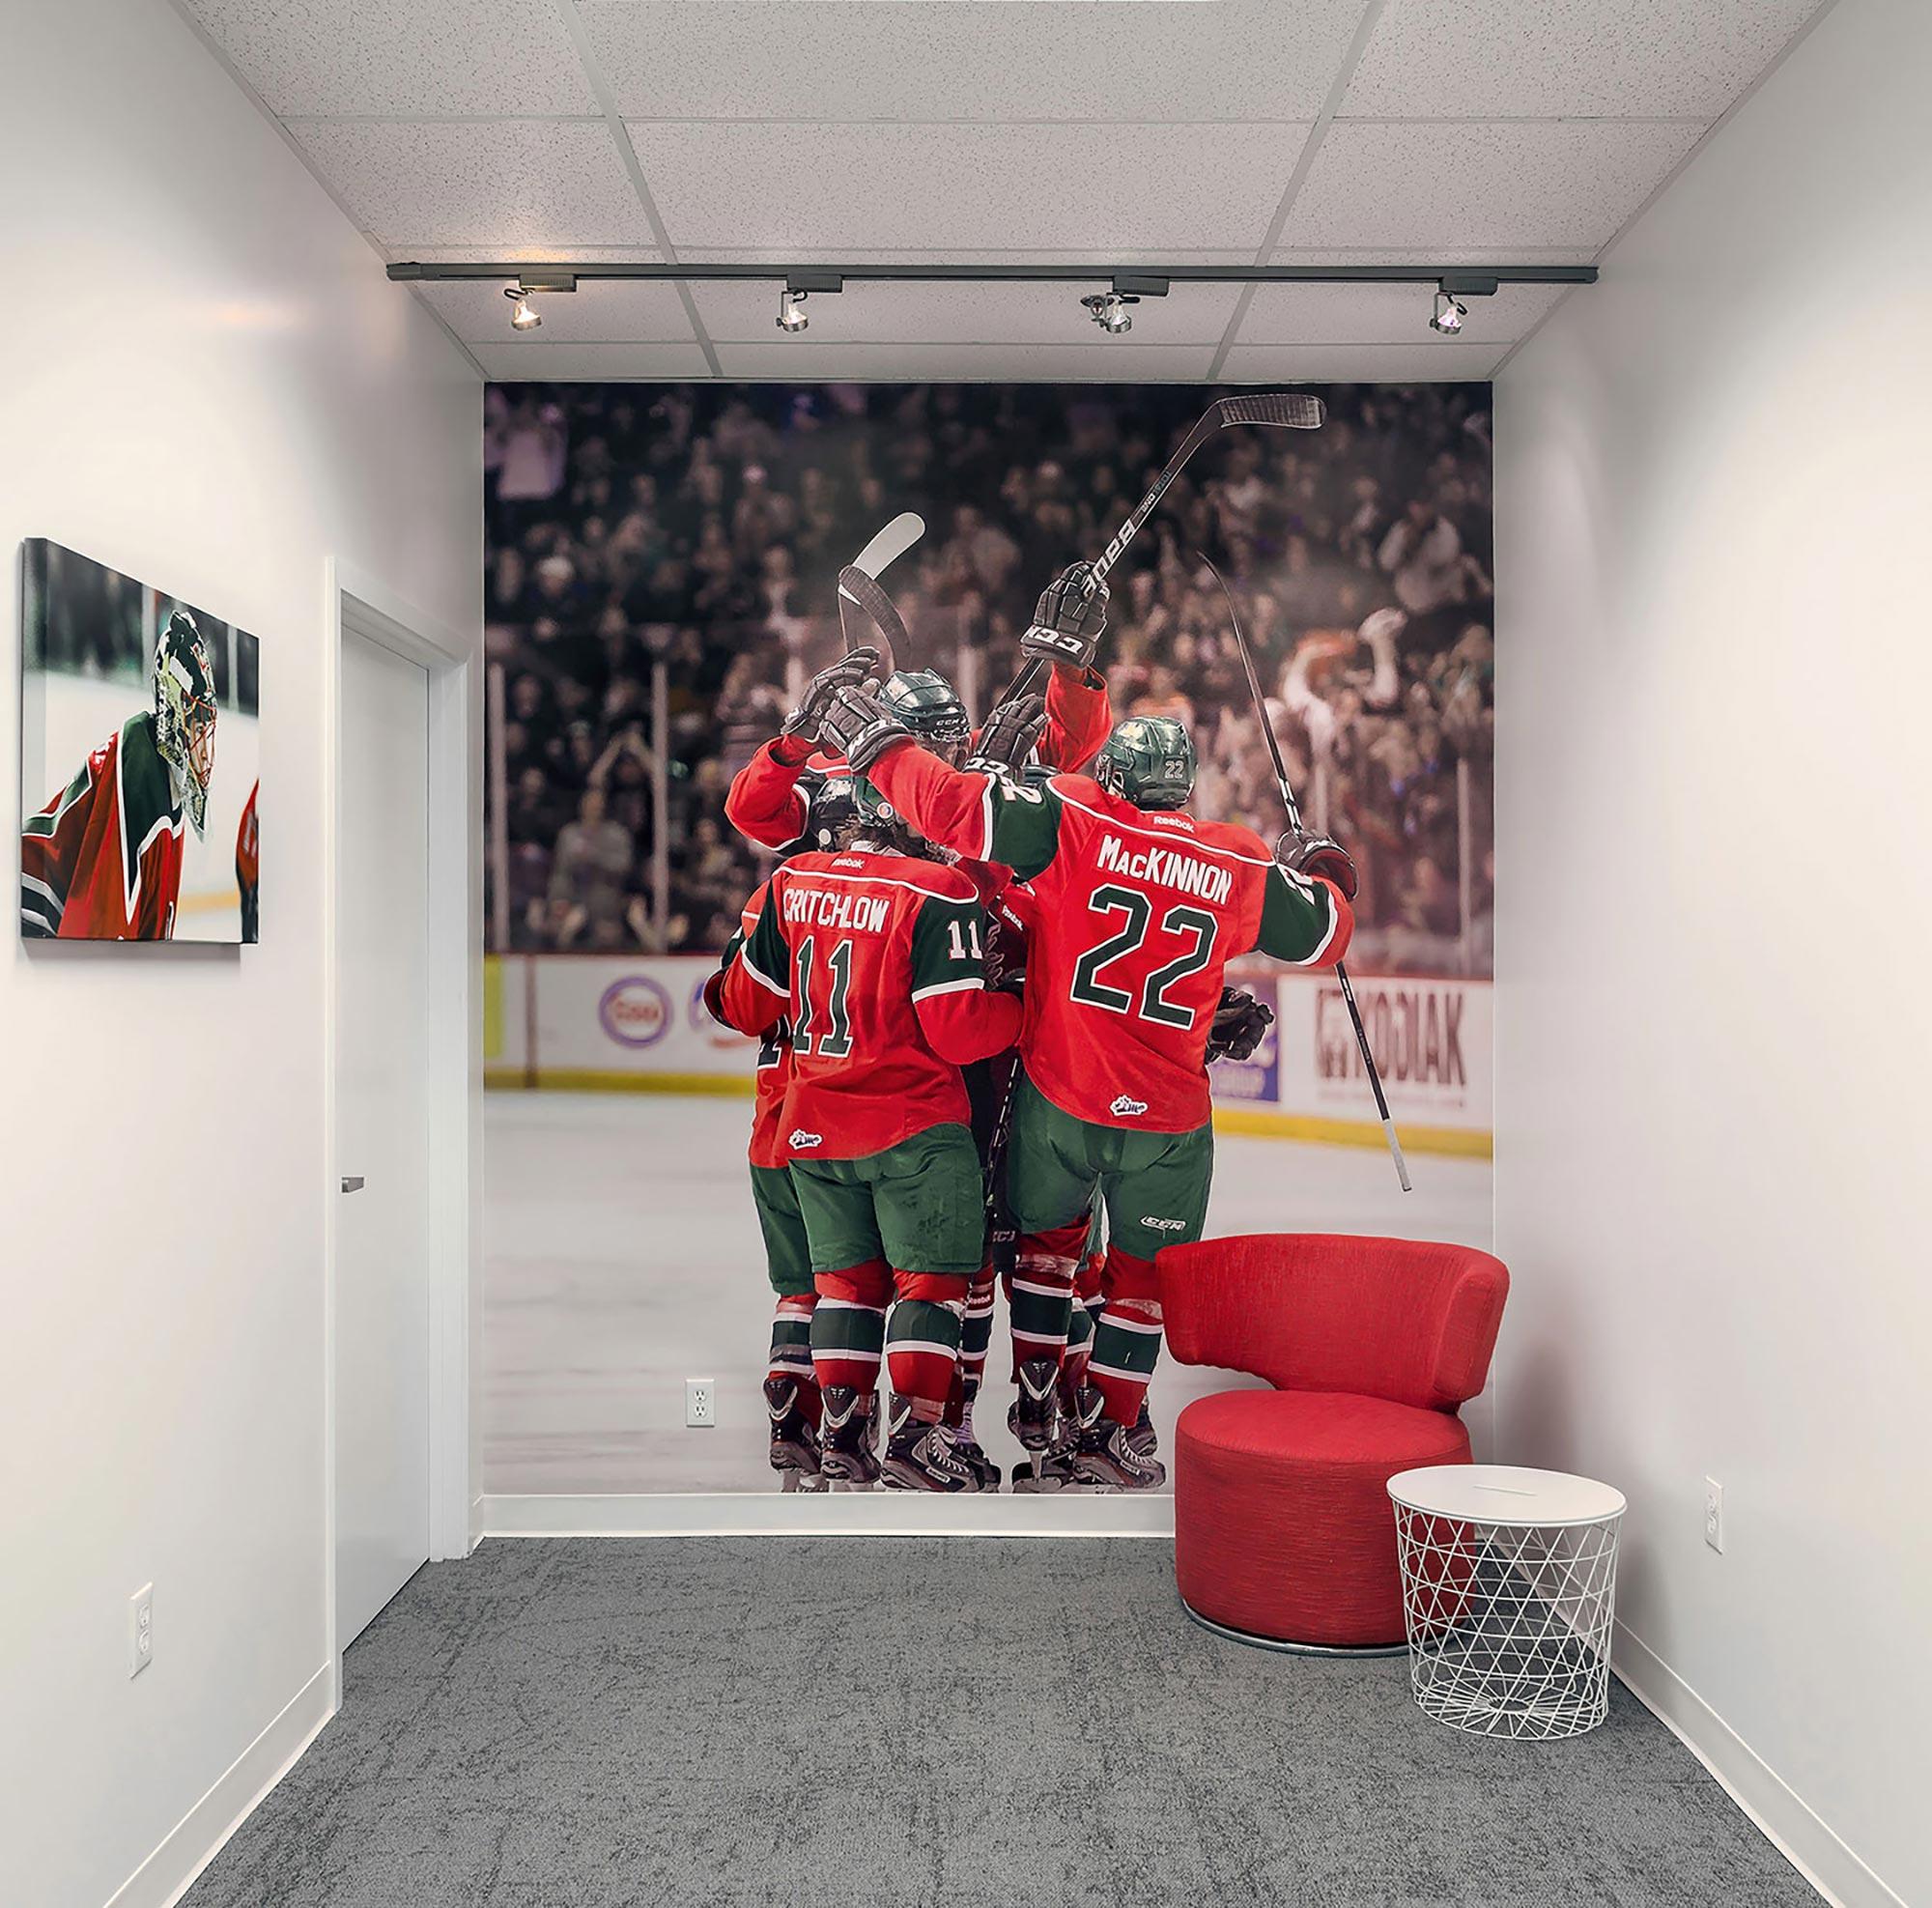 interior-design-athletic-hokcey-office-hallway.jpg